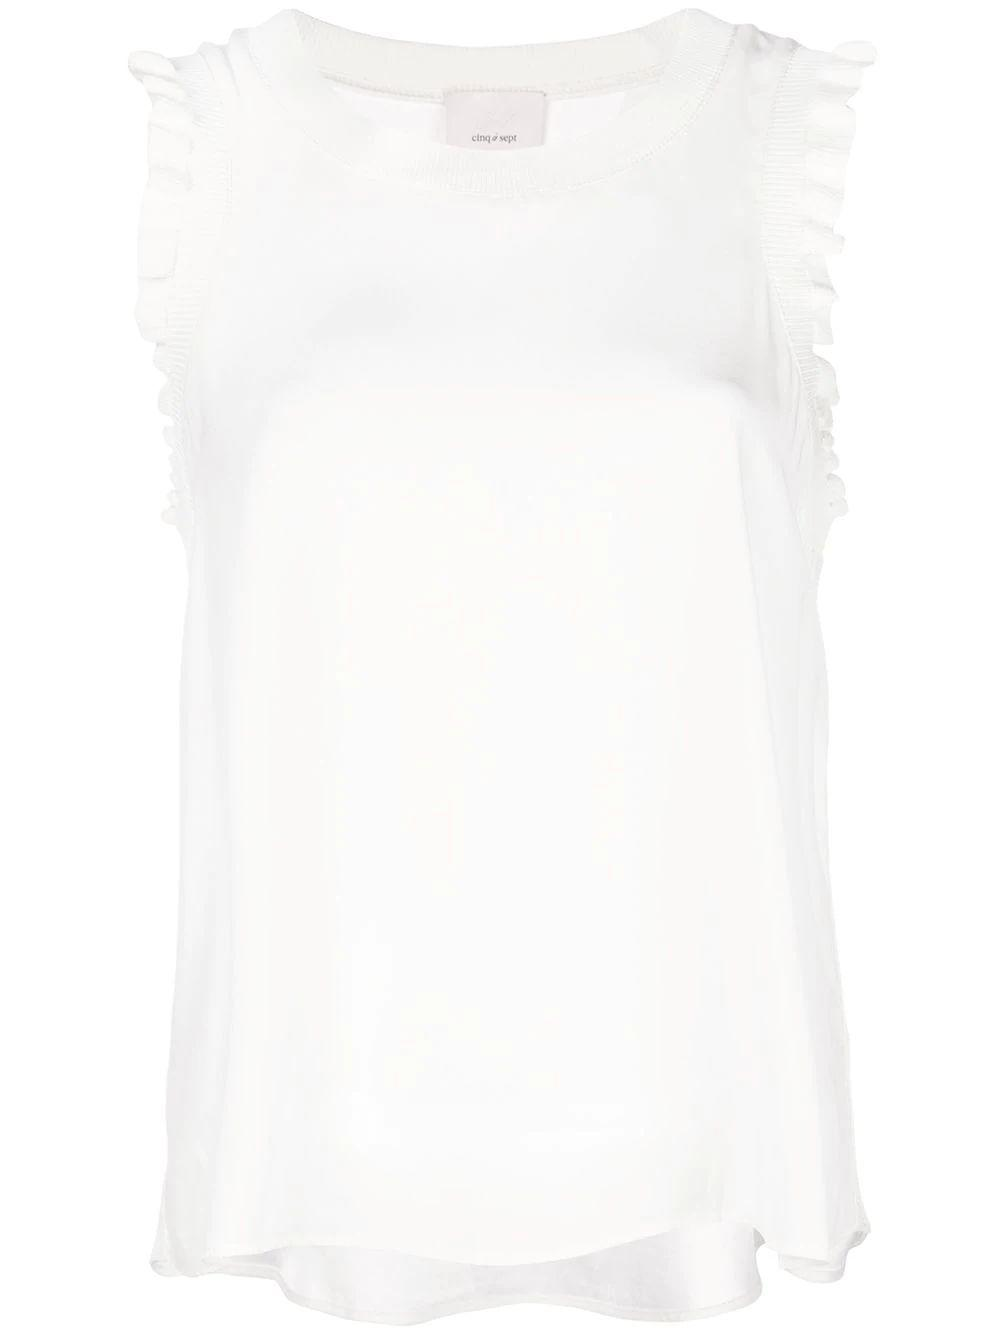 Lenore Sleeveless Ruffle Sleeve Top Item # ZK3561468Z-PF19